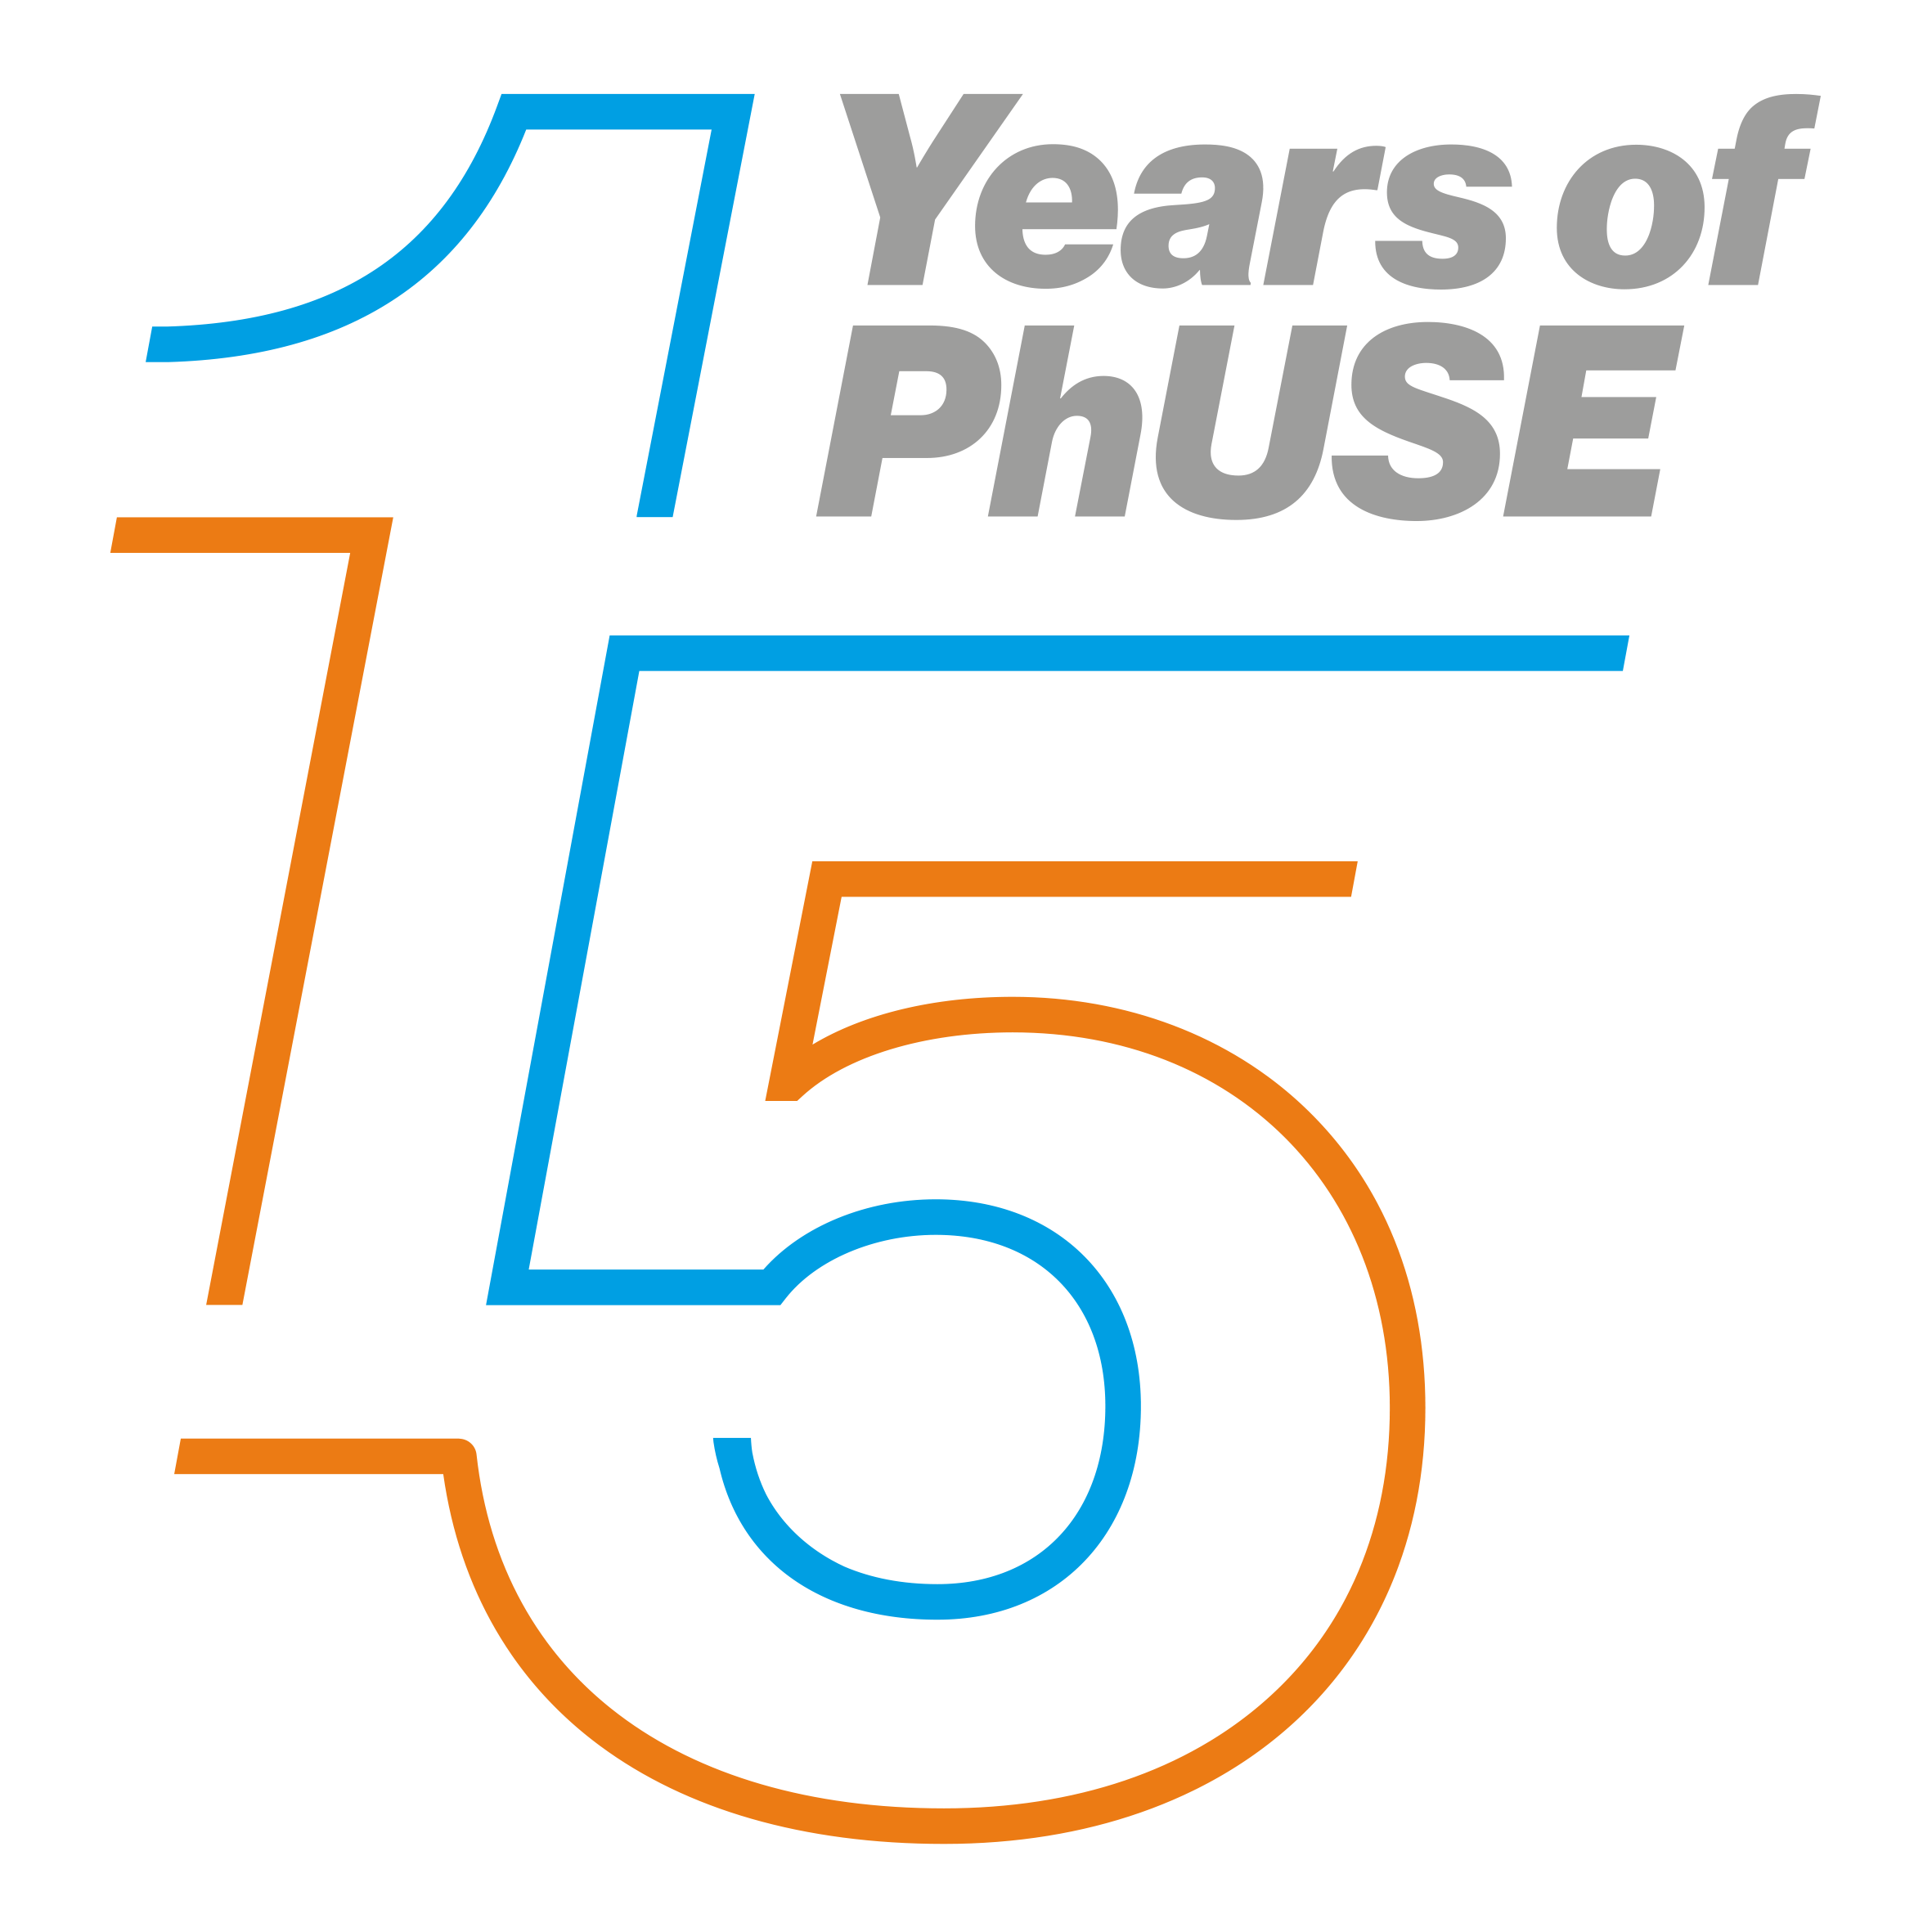 https://campaign-image.com/zohocampaigns/415763000013949592_zc_v161_phuse_15_year_logo_–_blue_orange_–_white_bg.png